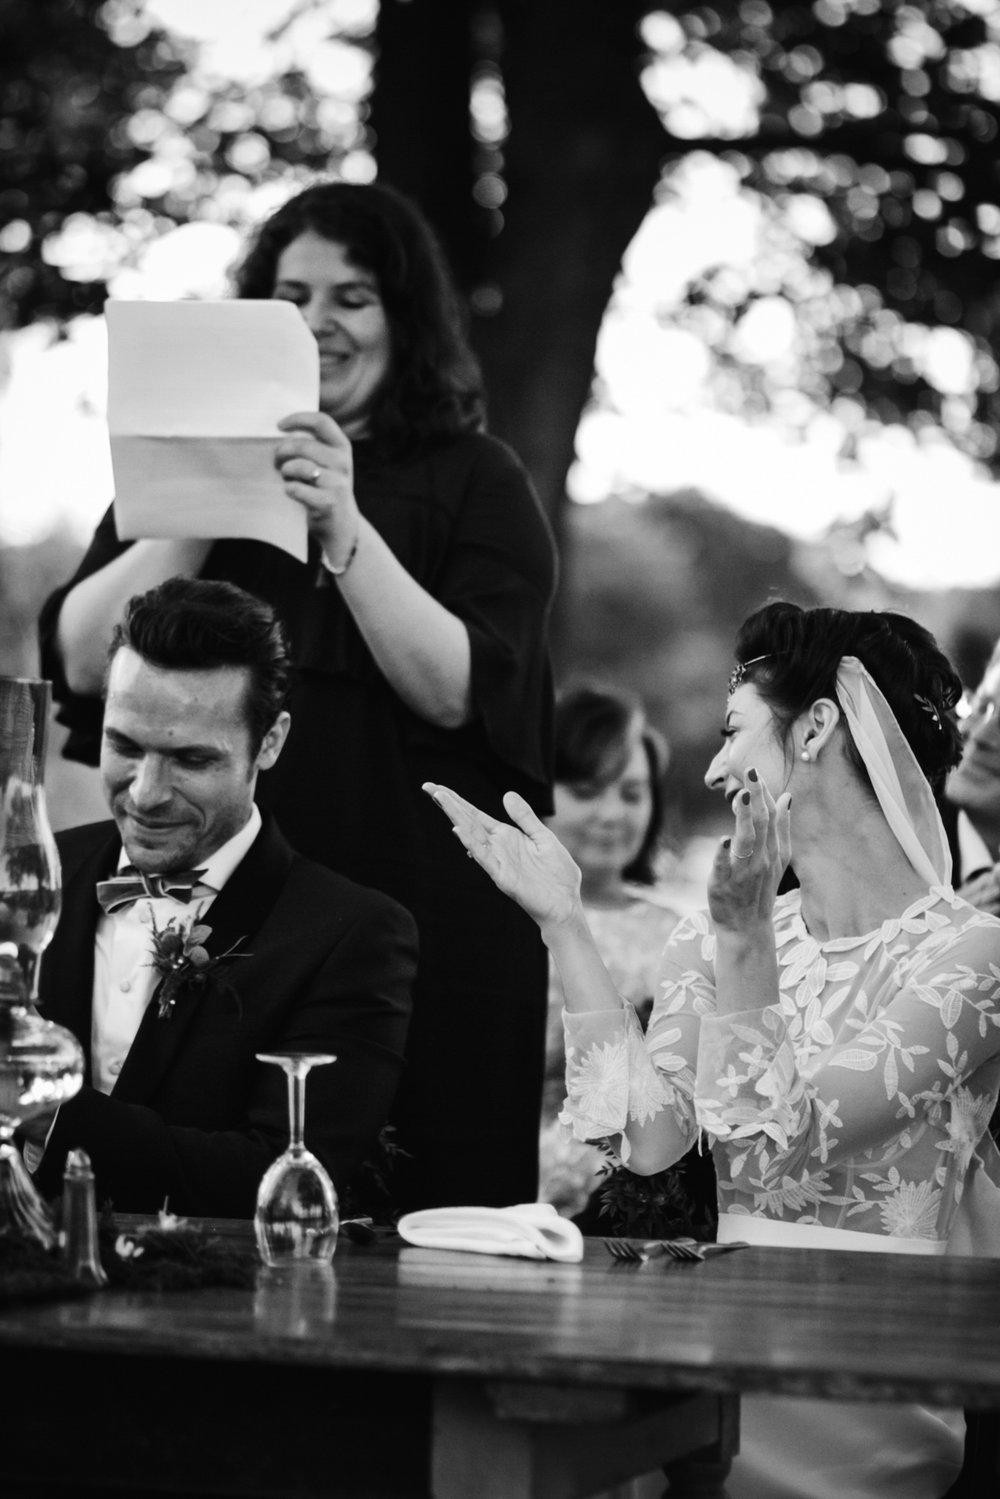 Kimberly-Coccagnia-Wedding-Photographer-240.JPG